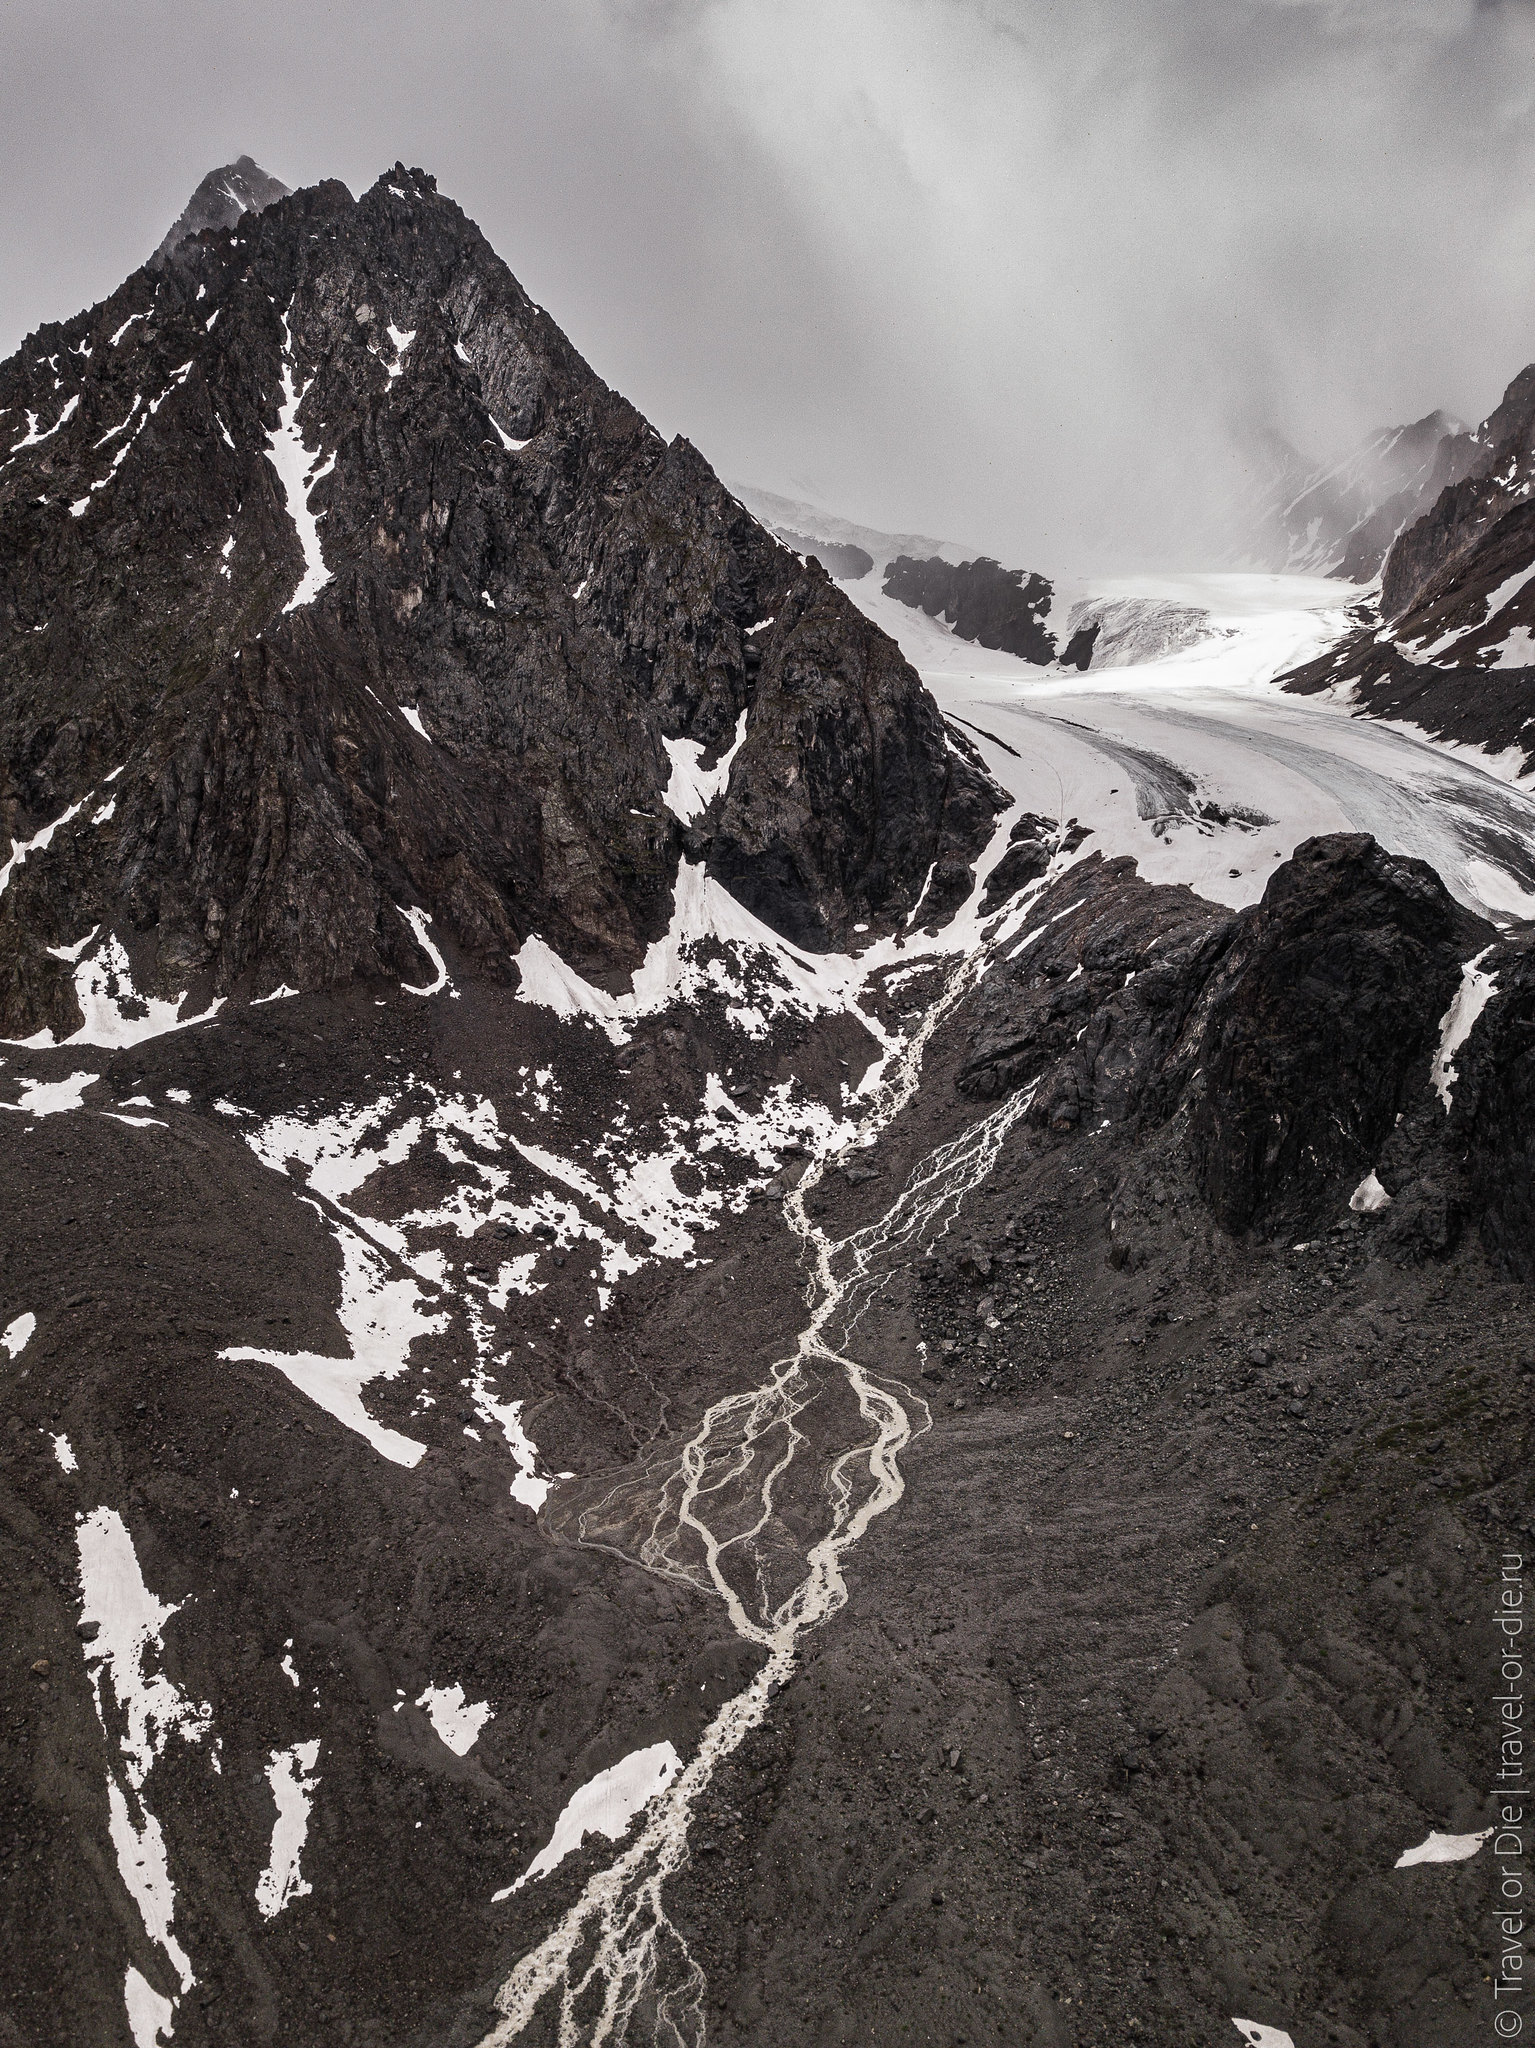 Aktru-Glacier-Altay-Ледник-Актру-Алтай-dji-mavic-0512